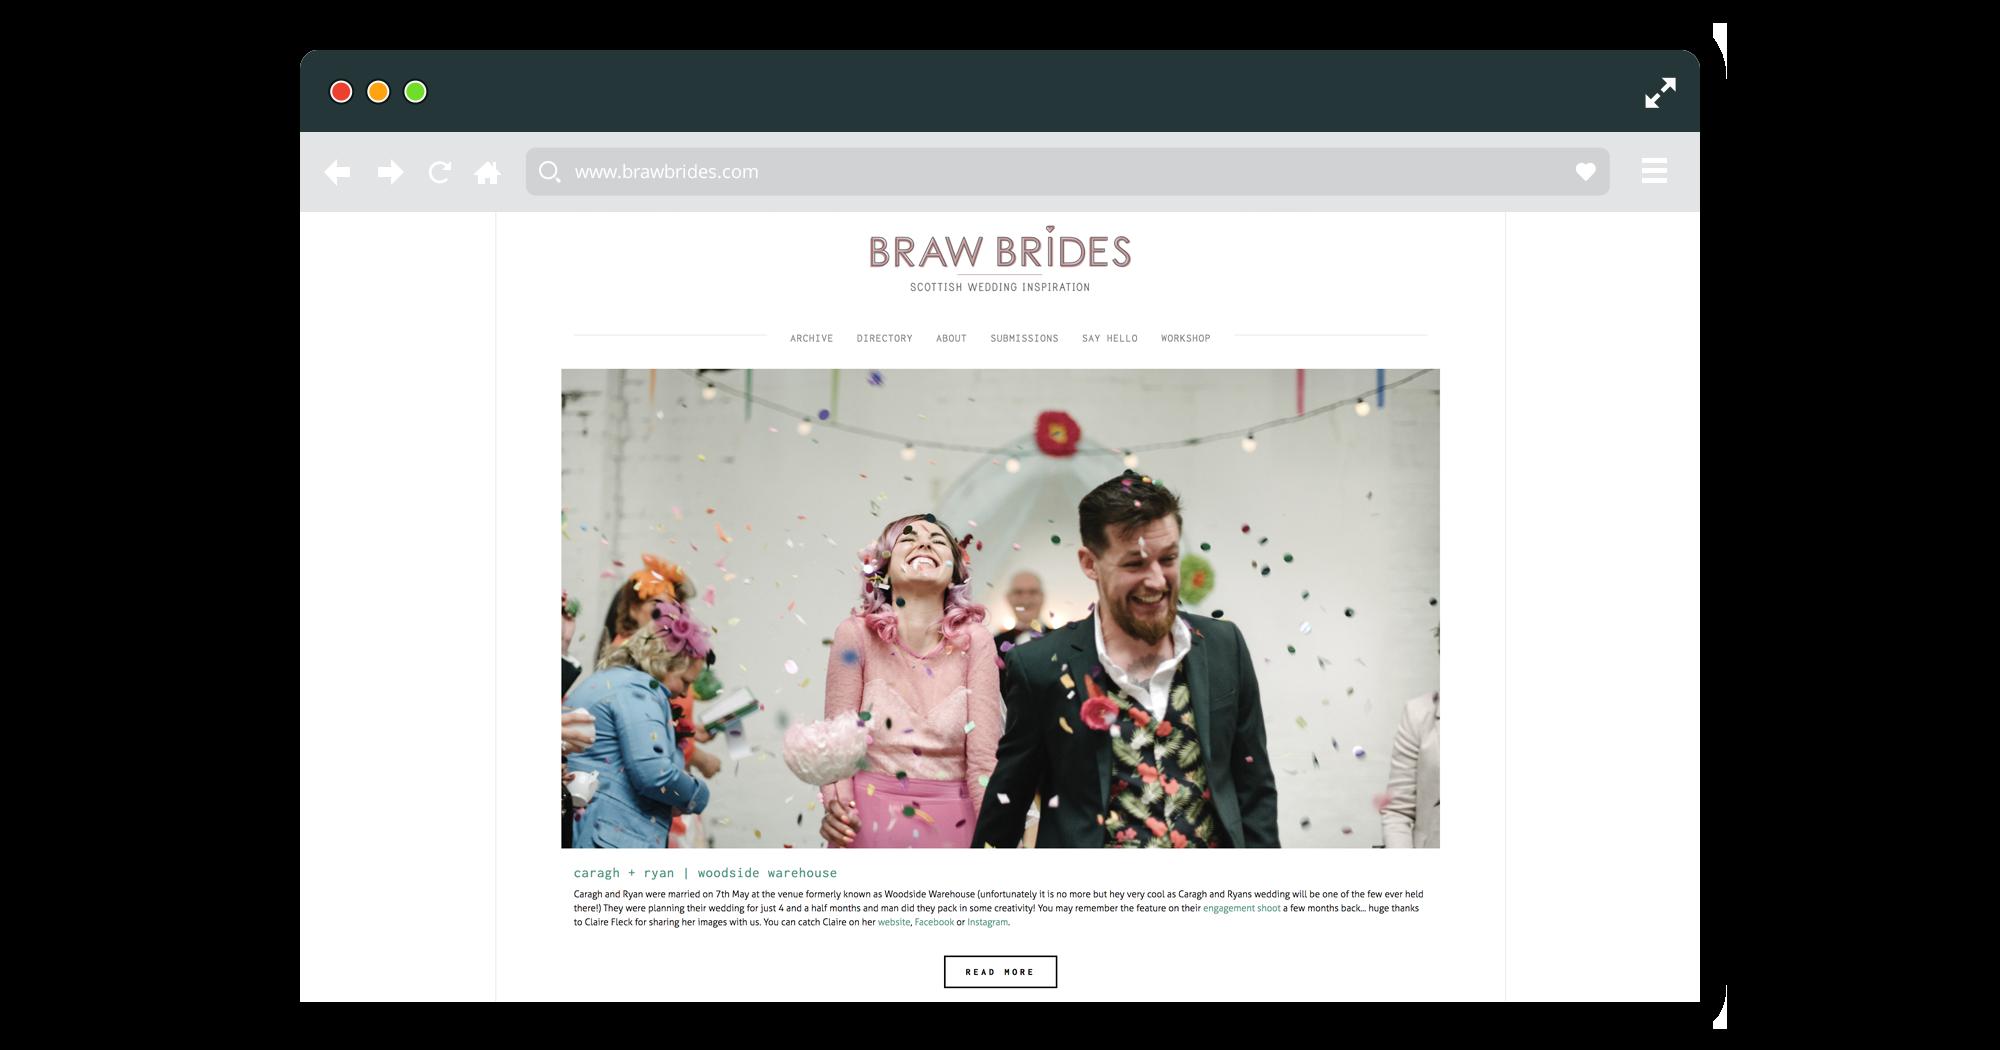 website-design-glasgow-agency-walnut-wasp-braw-brides